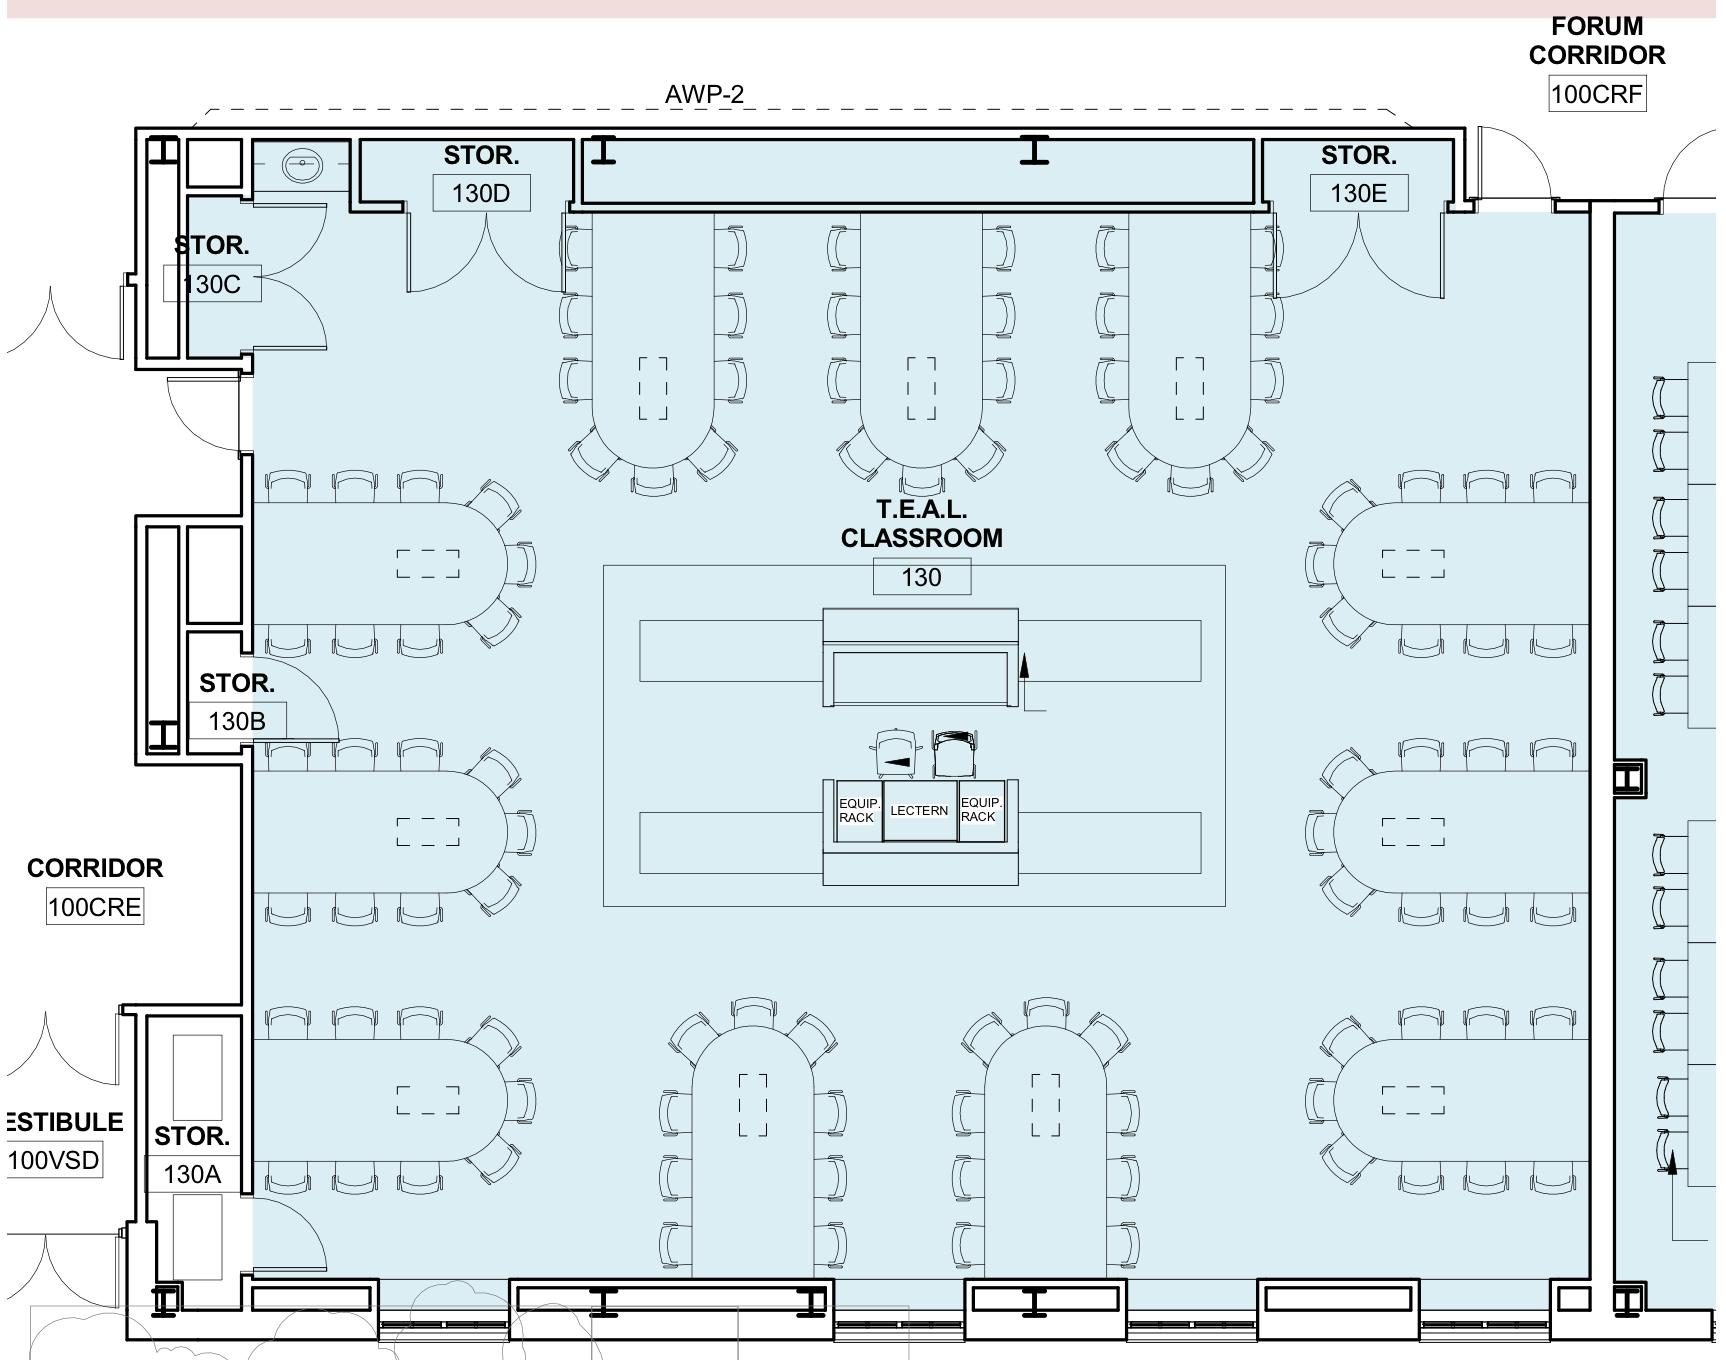 Image of Hamilton-Smith TEAL 99-seat blueprint